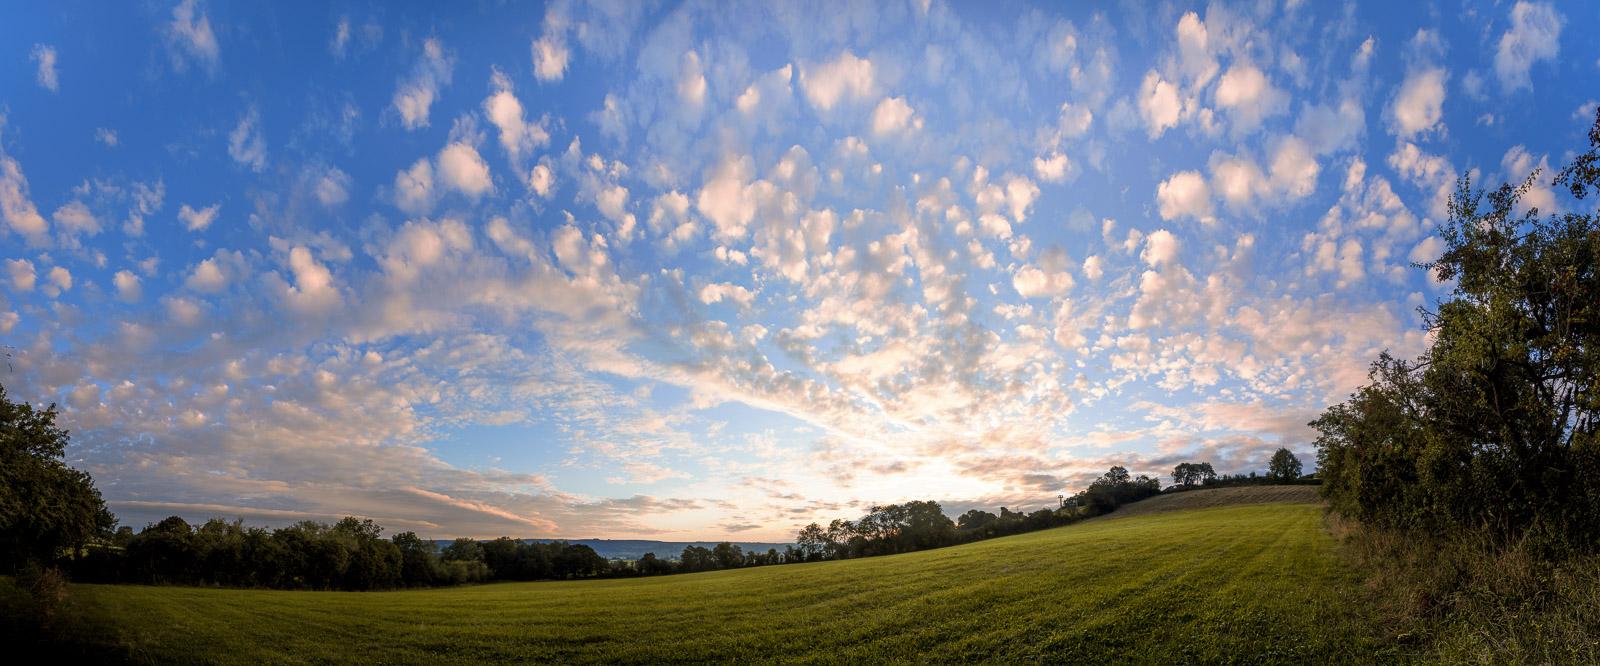 Sunrise at Bagley Fields - Nr Wedmore, Somerset, UK. ID BR55808P